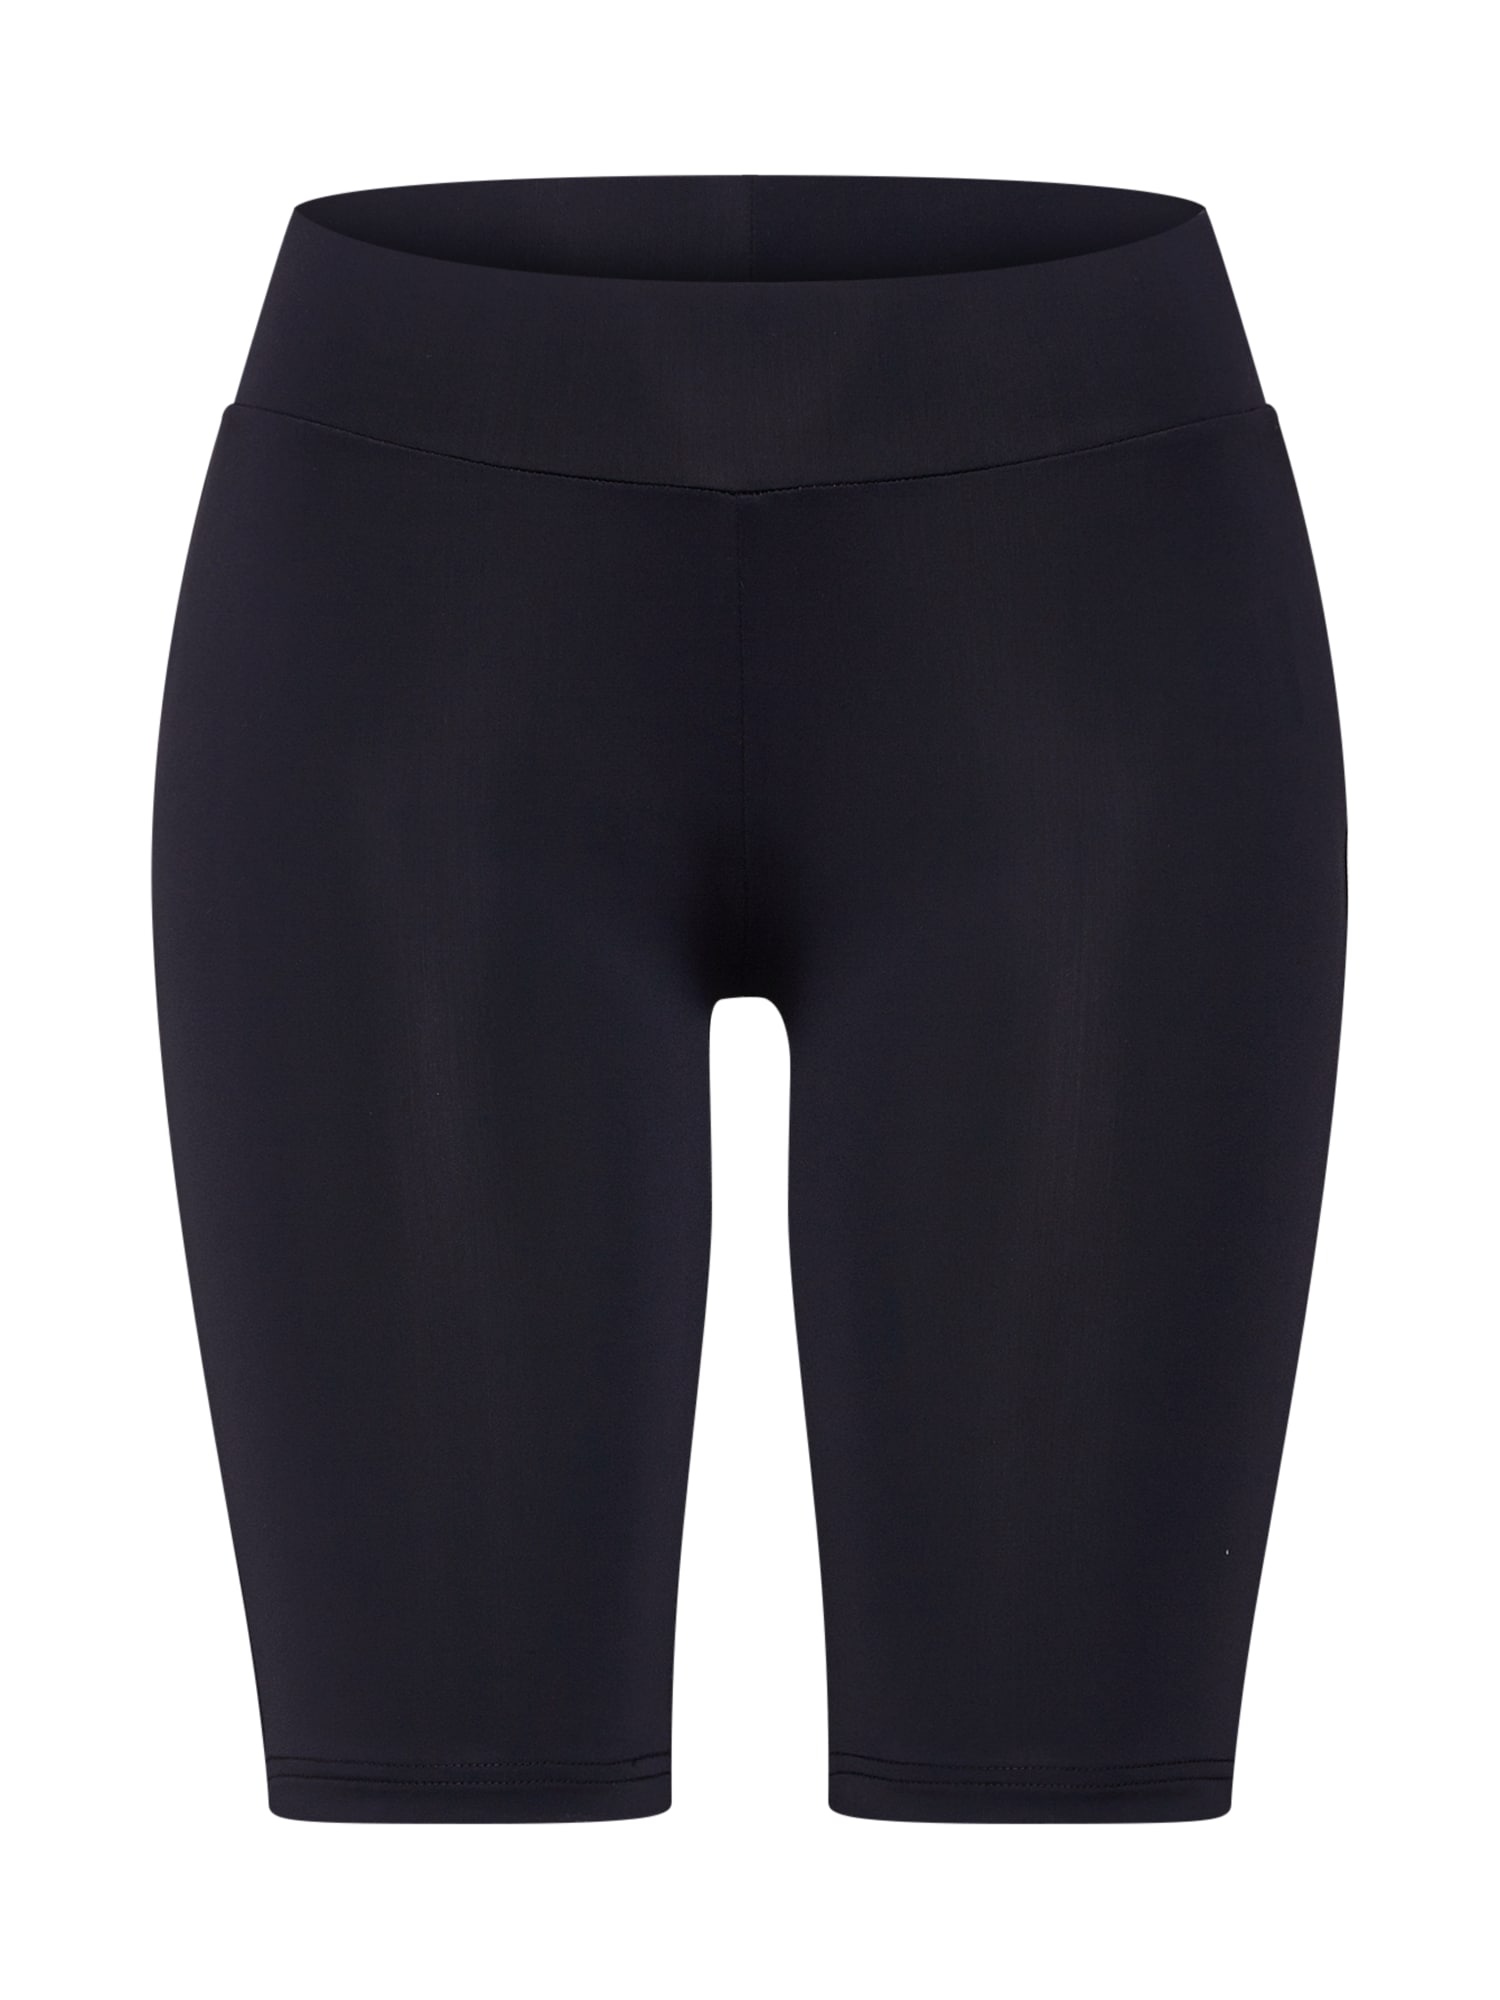 Urban Classics Tamprės 'Ladies Cycle Shorts' juoda